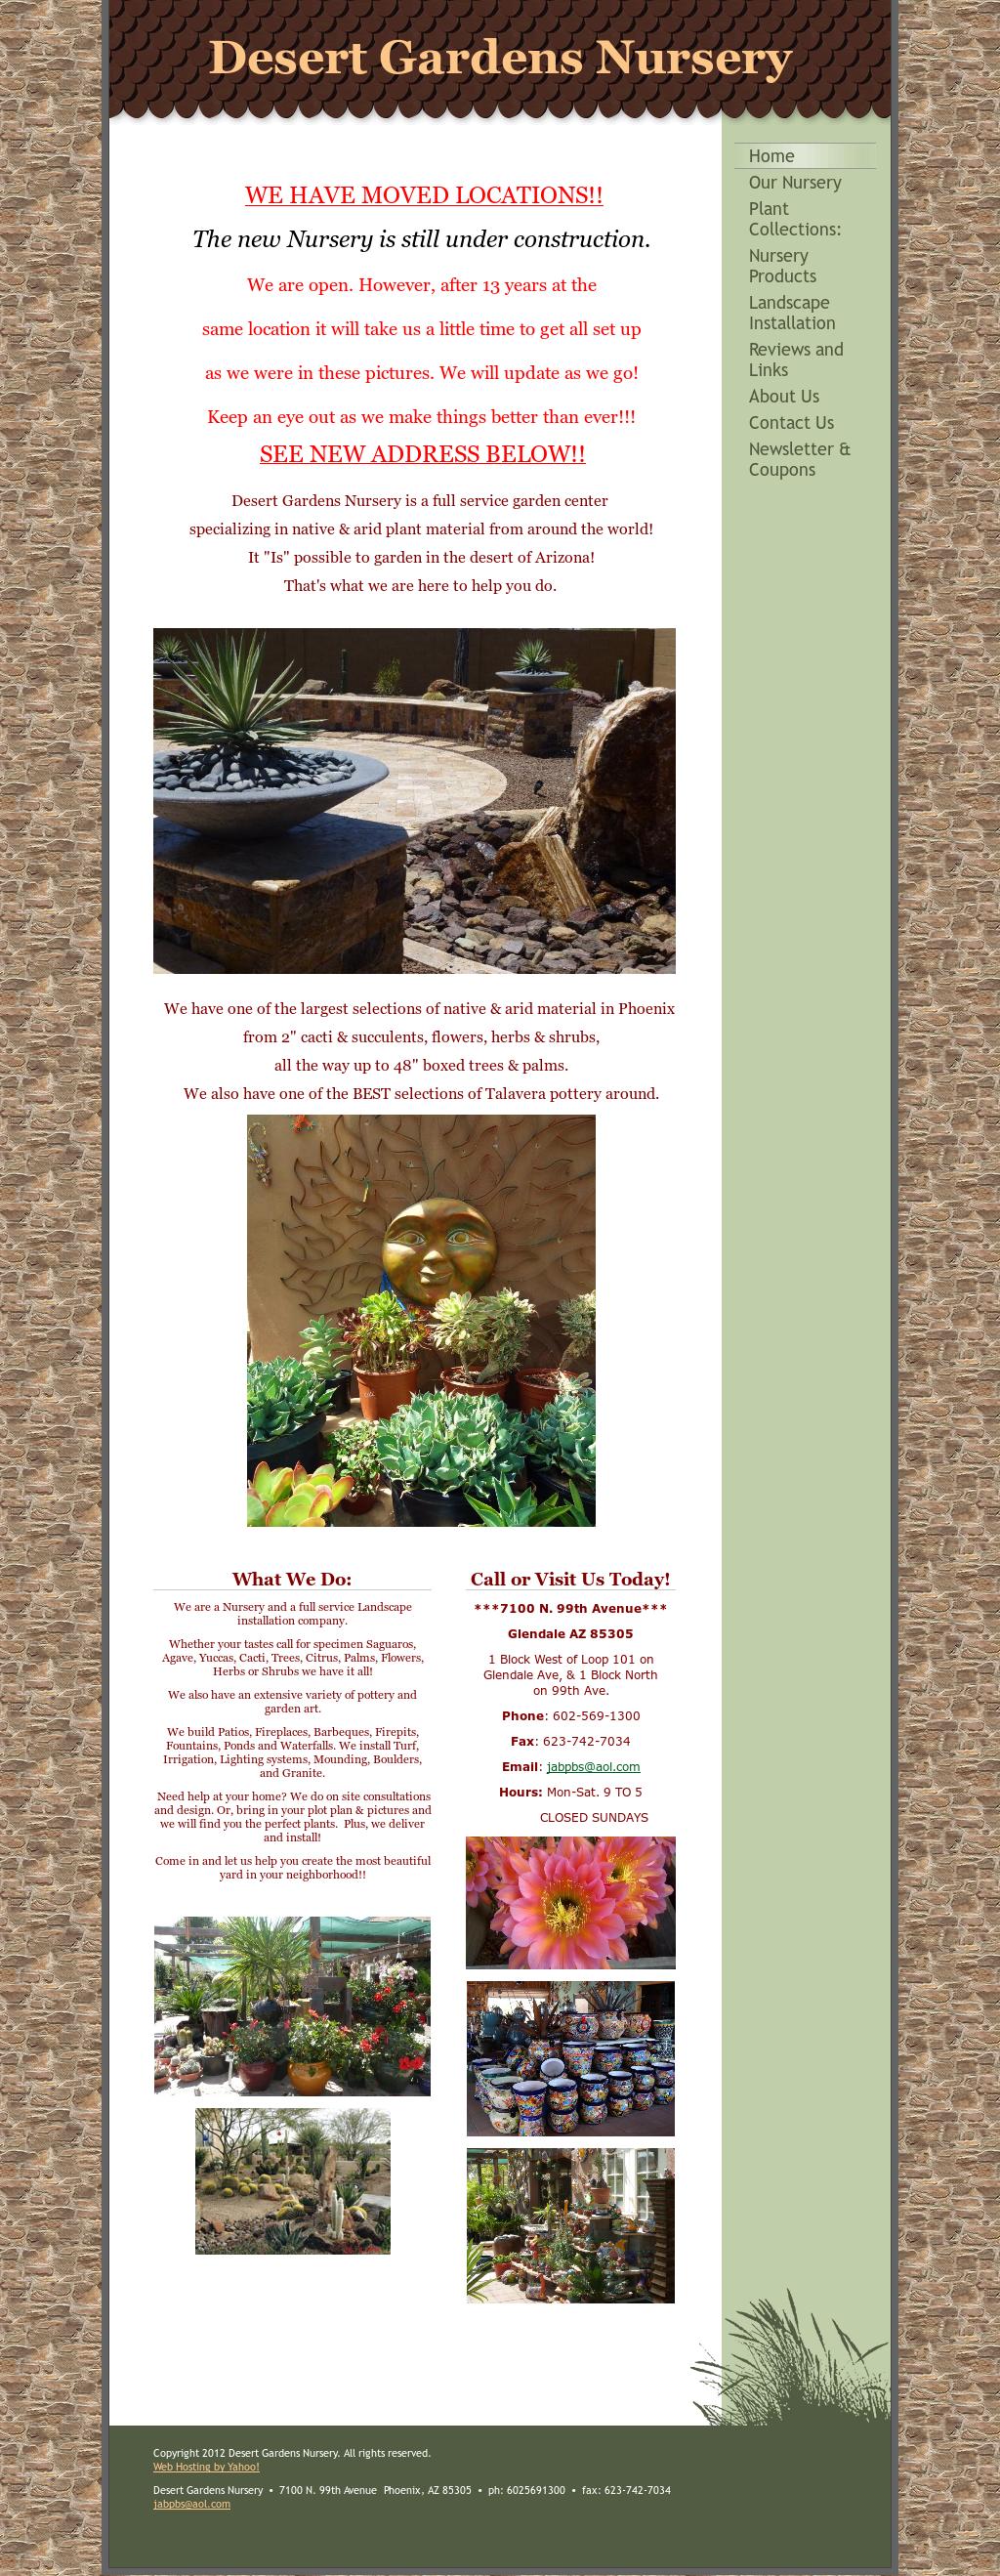 Desert Gardens Nursery Compeors Revenue And Employees